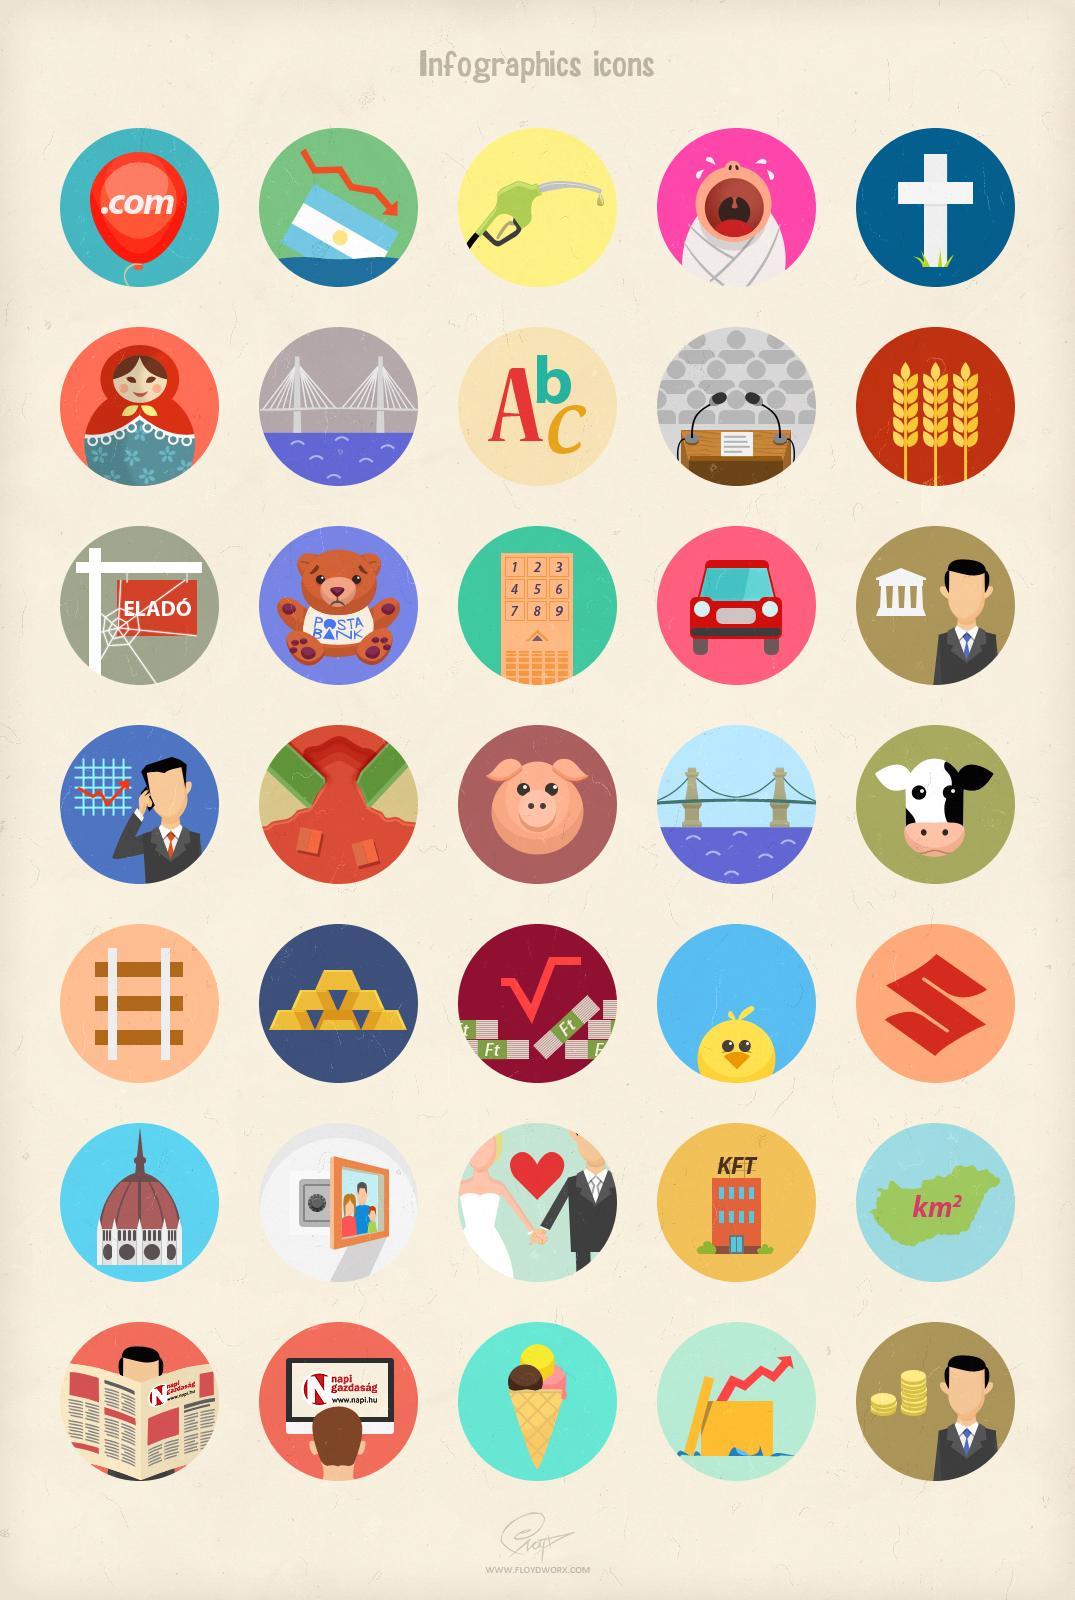 infographics icons by floydworx on deviantart